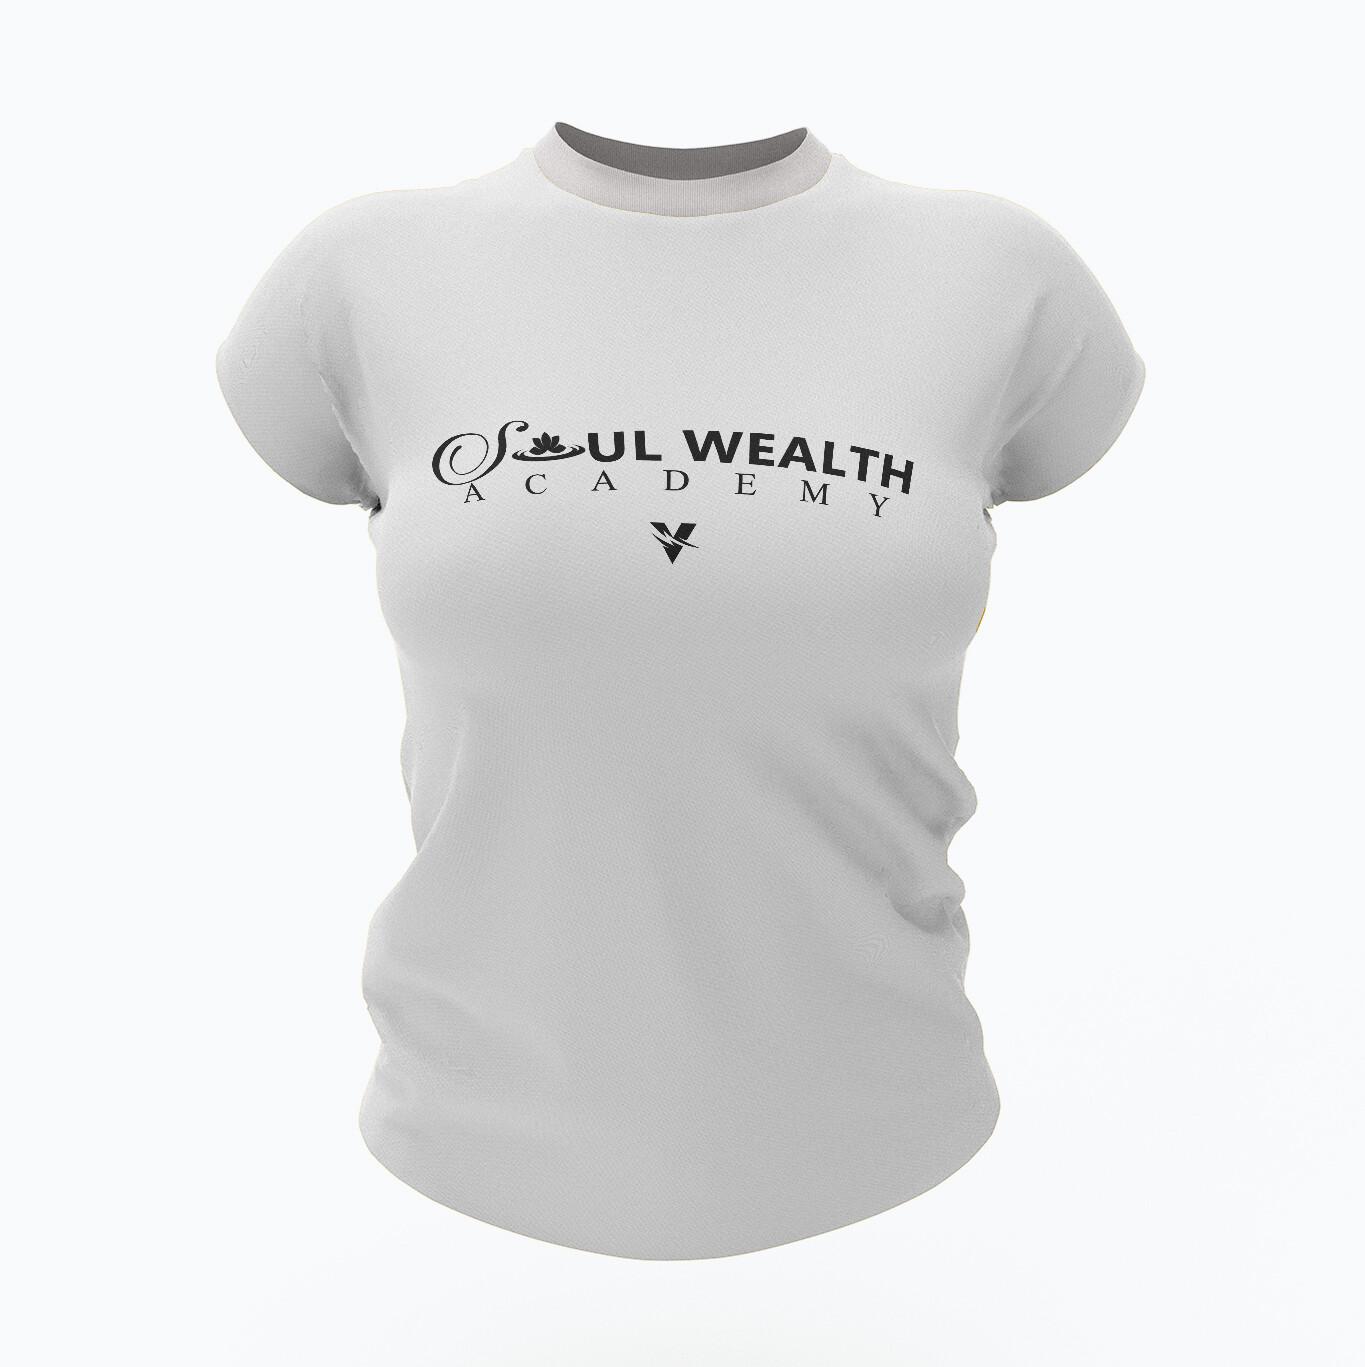 Soul Wealth Tee - White